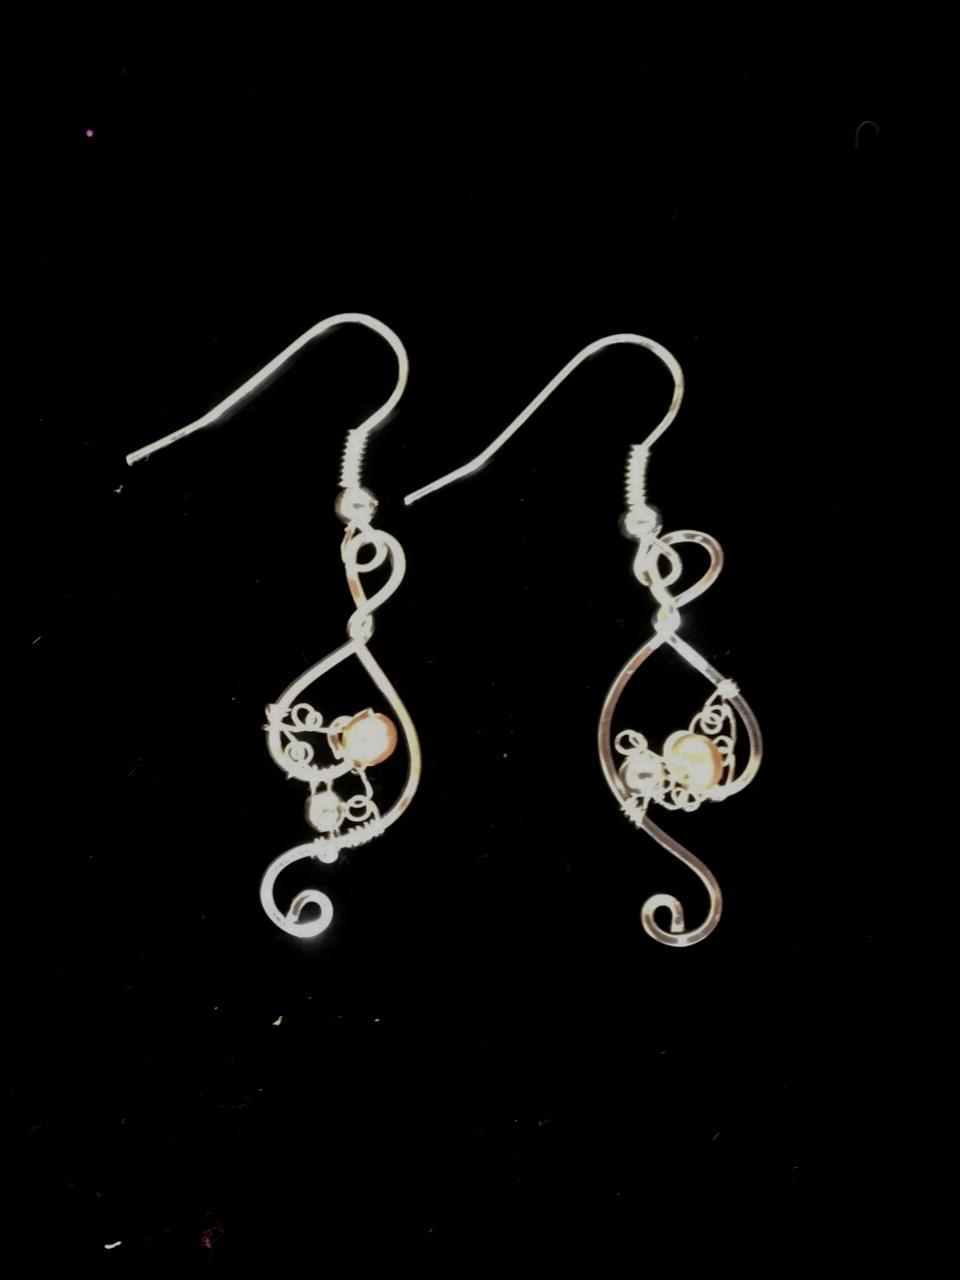 Dainty Deva Earrings - Pearls and Black Swarovsky